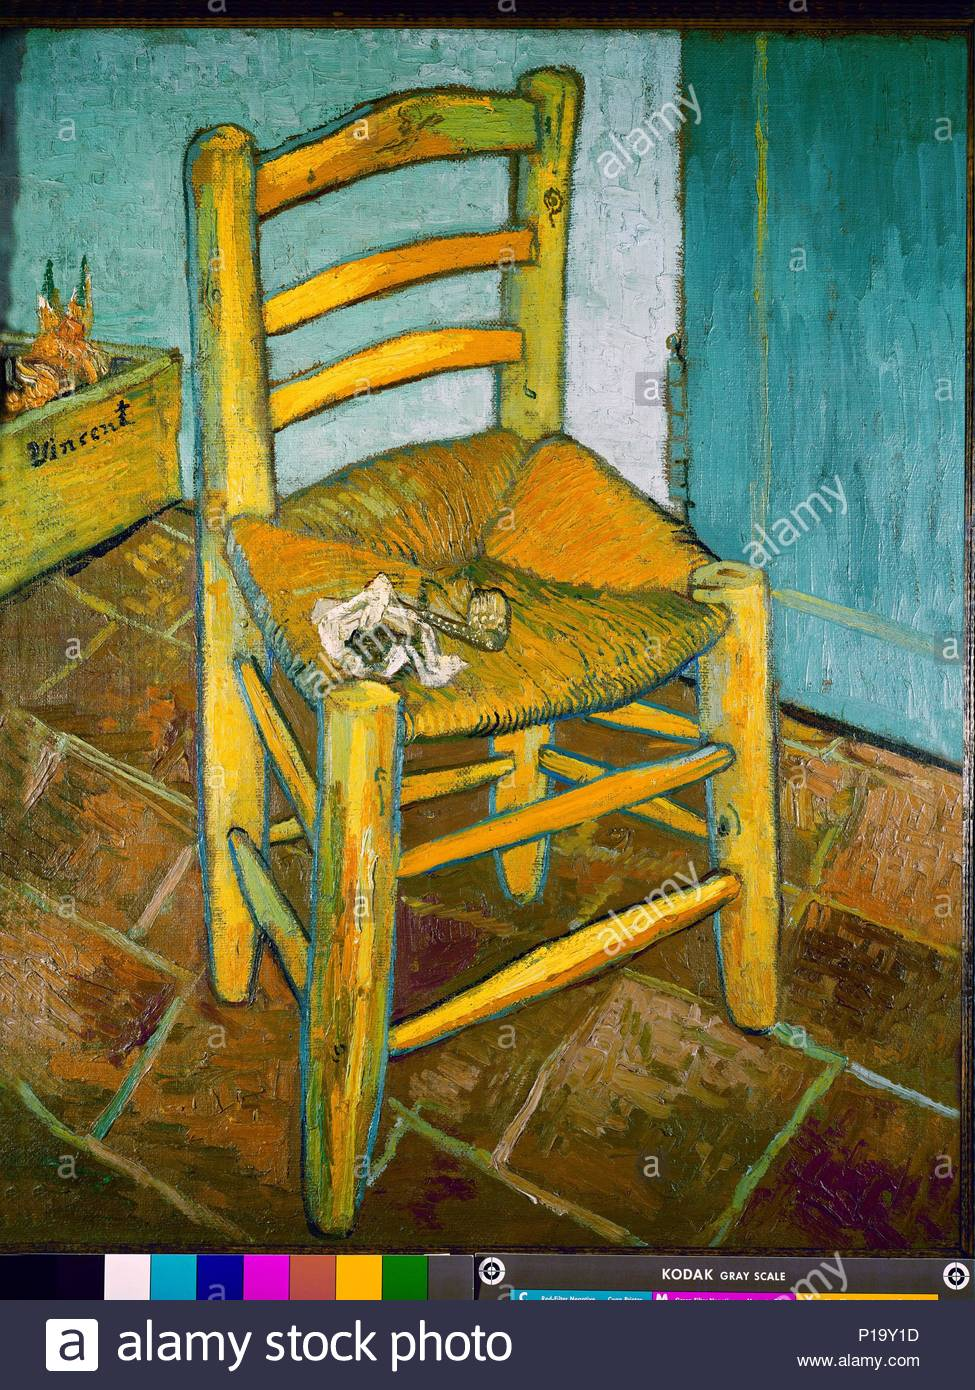 La Chaise De Vincent Van Goghs Chair 1888 Ol Auf Leinwand 918 X 73 Cm NG 3852 Autor Gogh 1853 1890 Lage National Gallery London